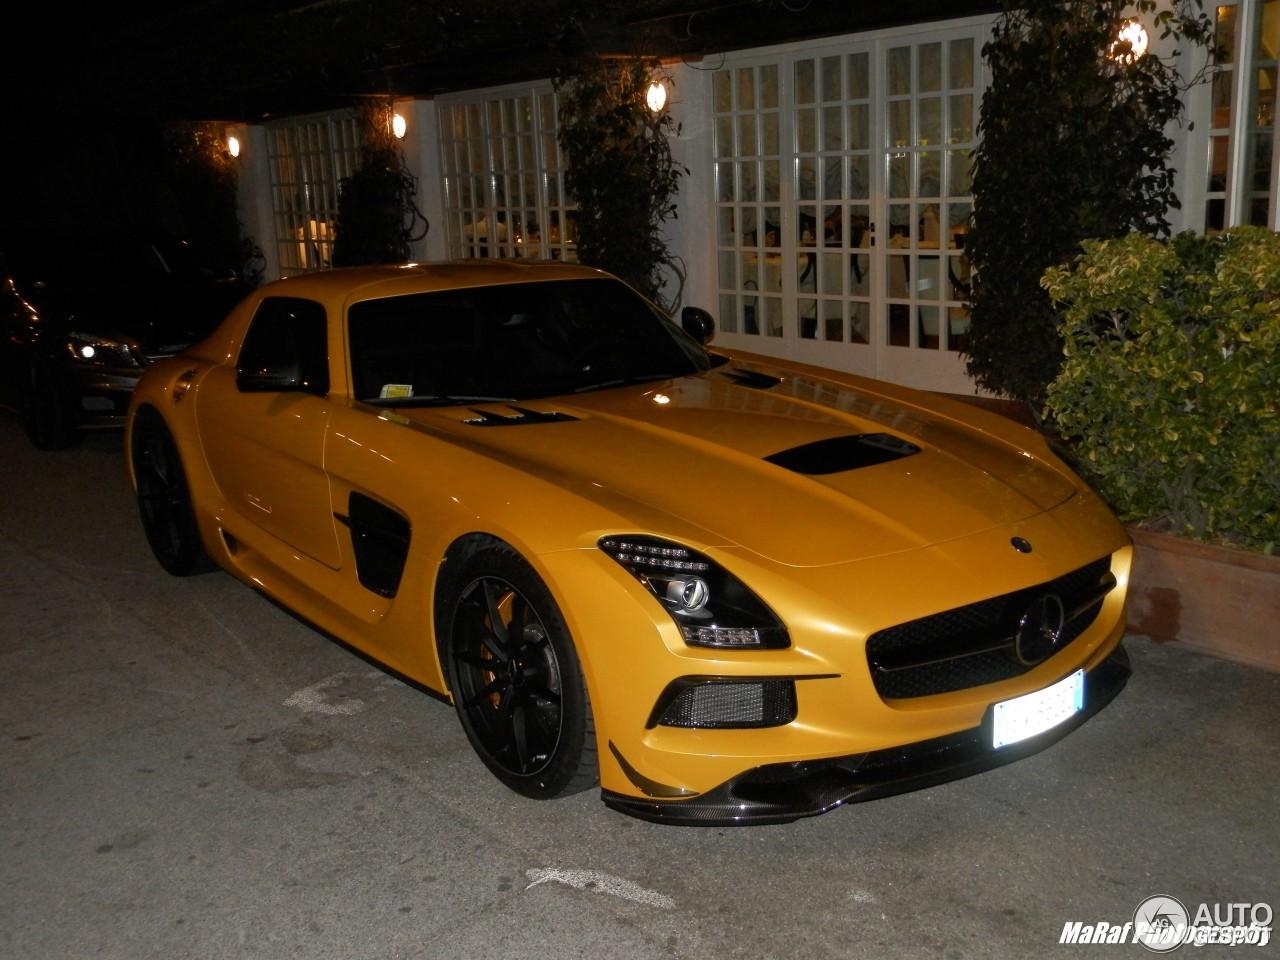 Mercedes benz sls amg black series 6 august 2014 for 2014 mercedes benz sls amg black series